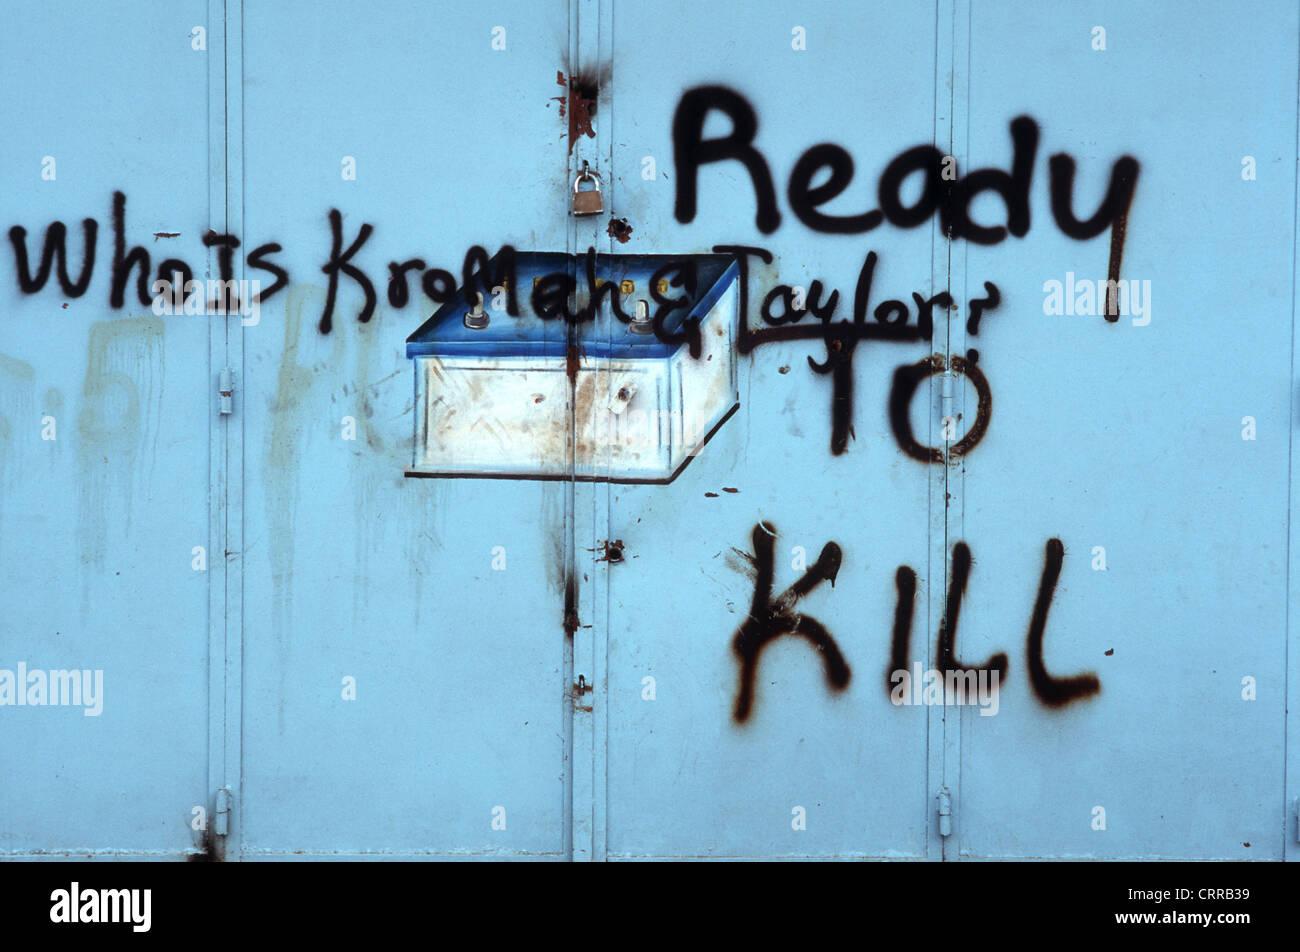 Liberia, graffiti in Monrovia, Ready to Kill - Stock Image